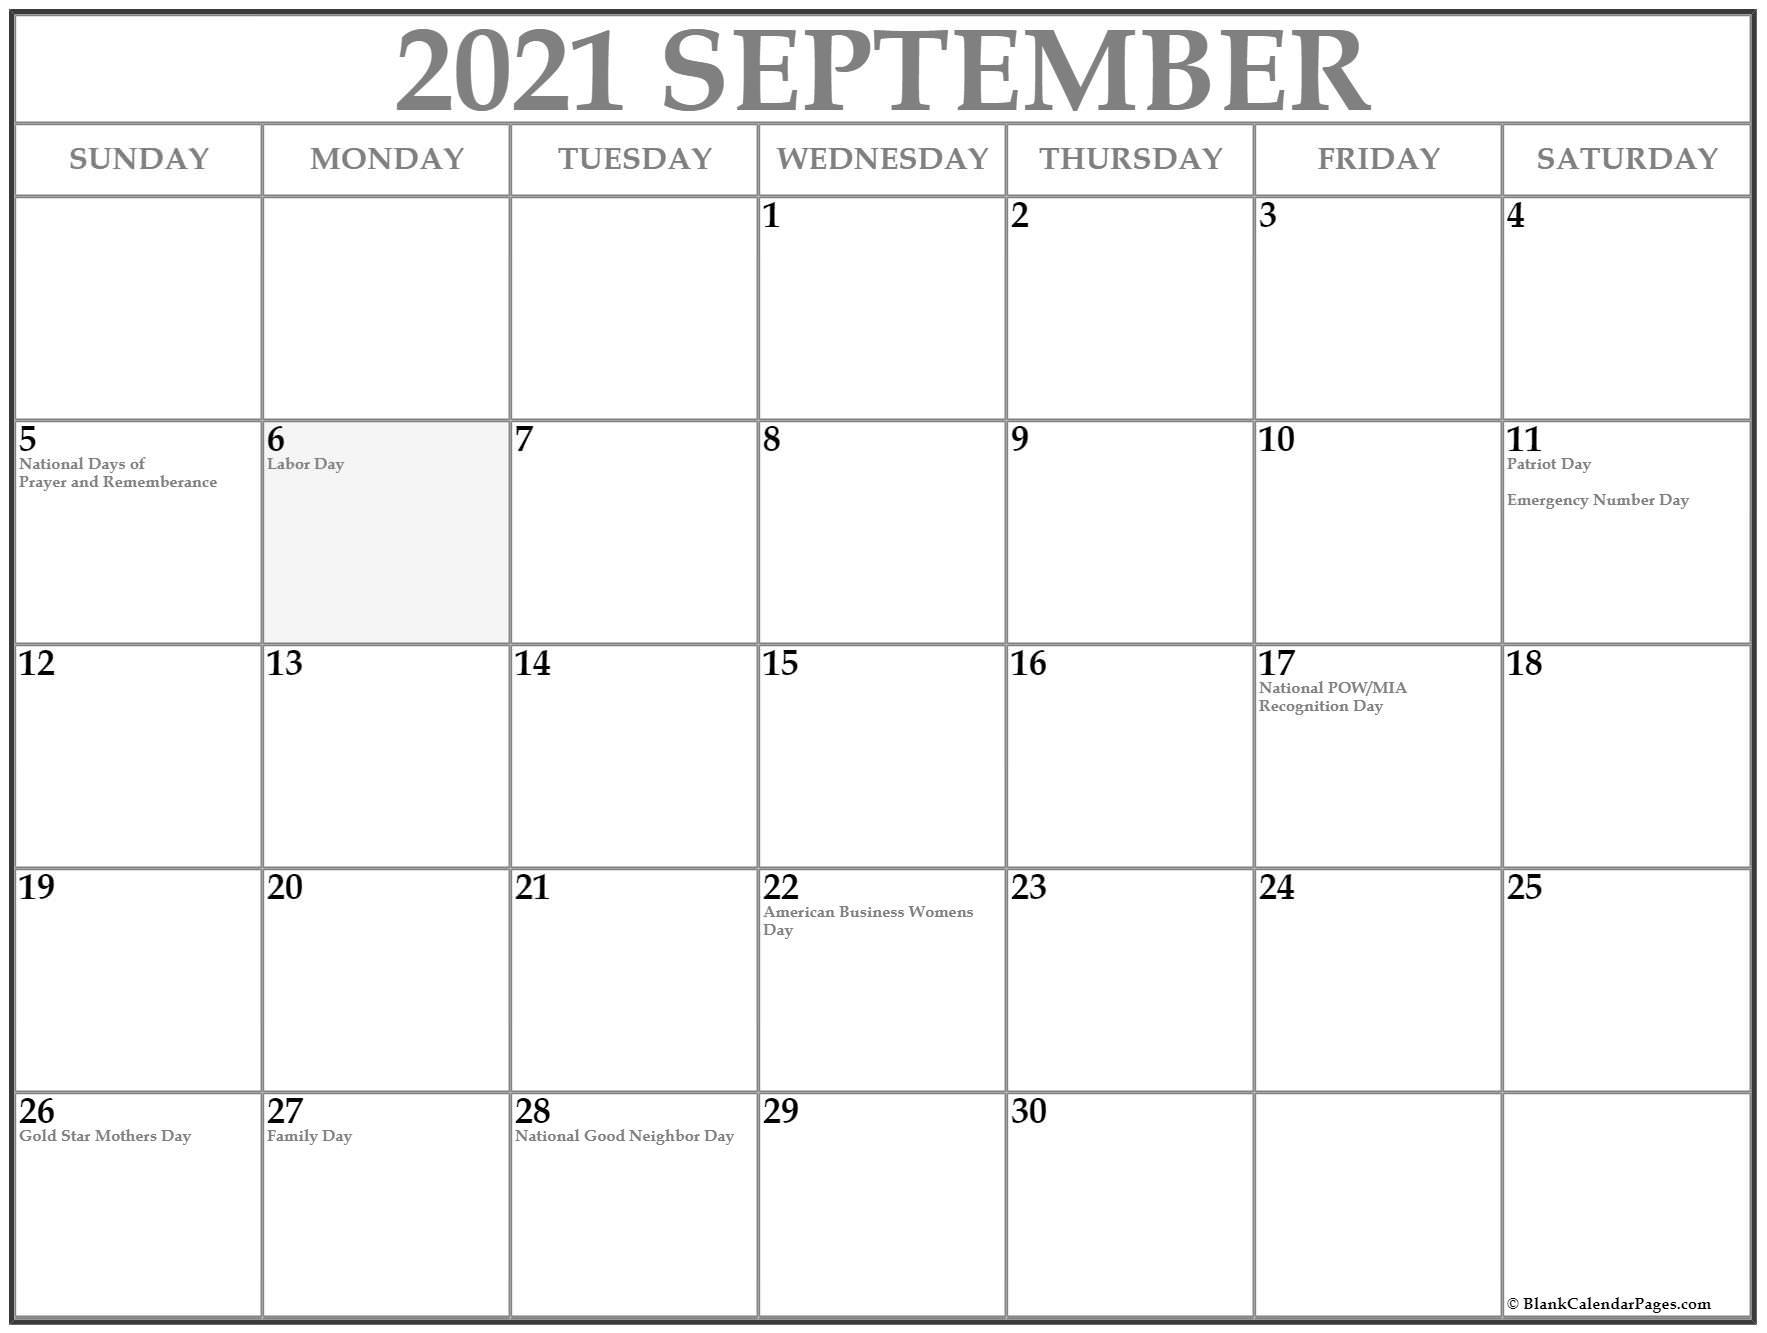 September 2021 With Holidays Calendar September - December 2021 Calendar